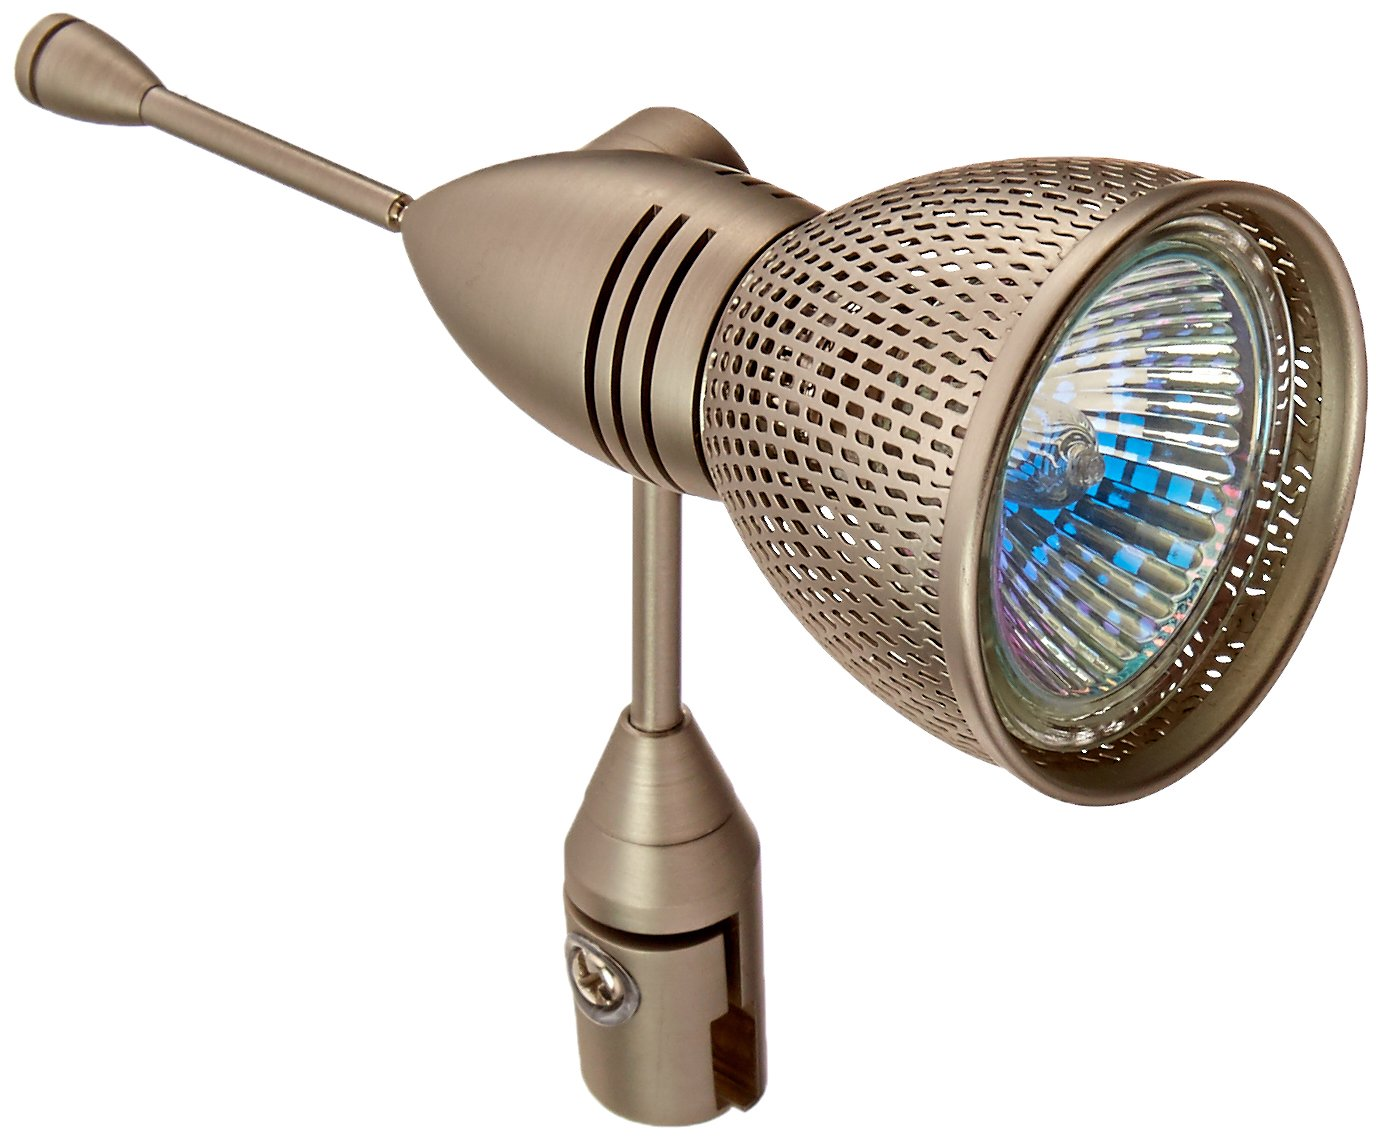 WAC Lighting QF-9415-BN/BN Low Voltage Monorail Qc Fixture Kit